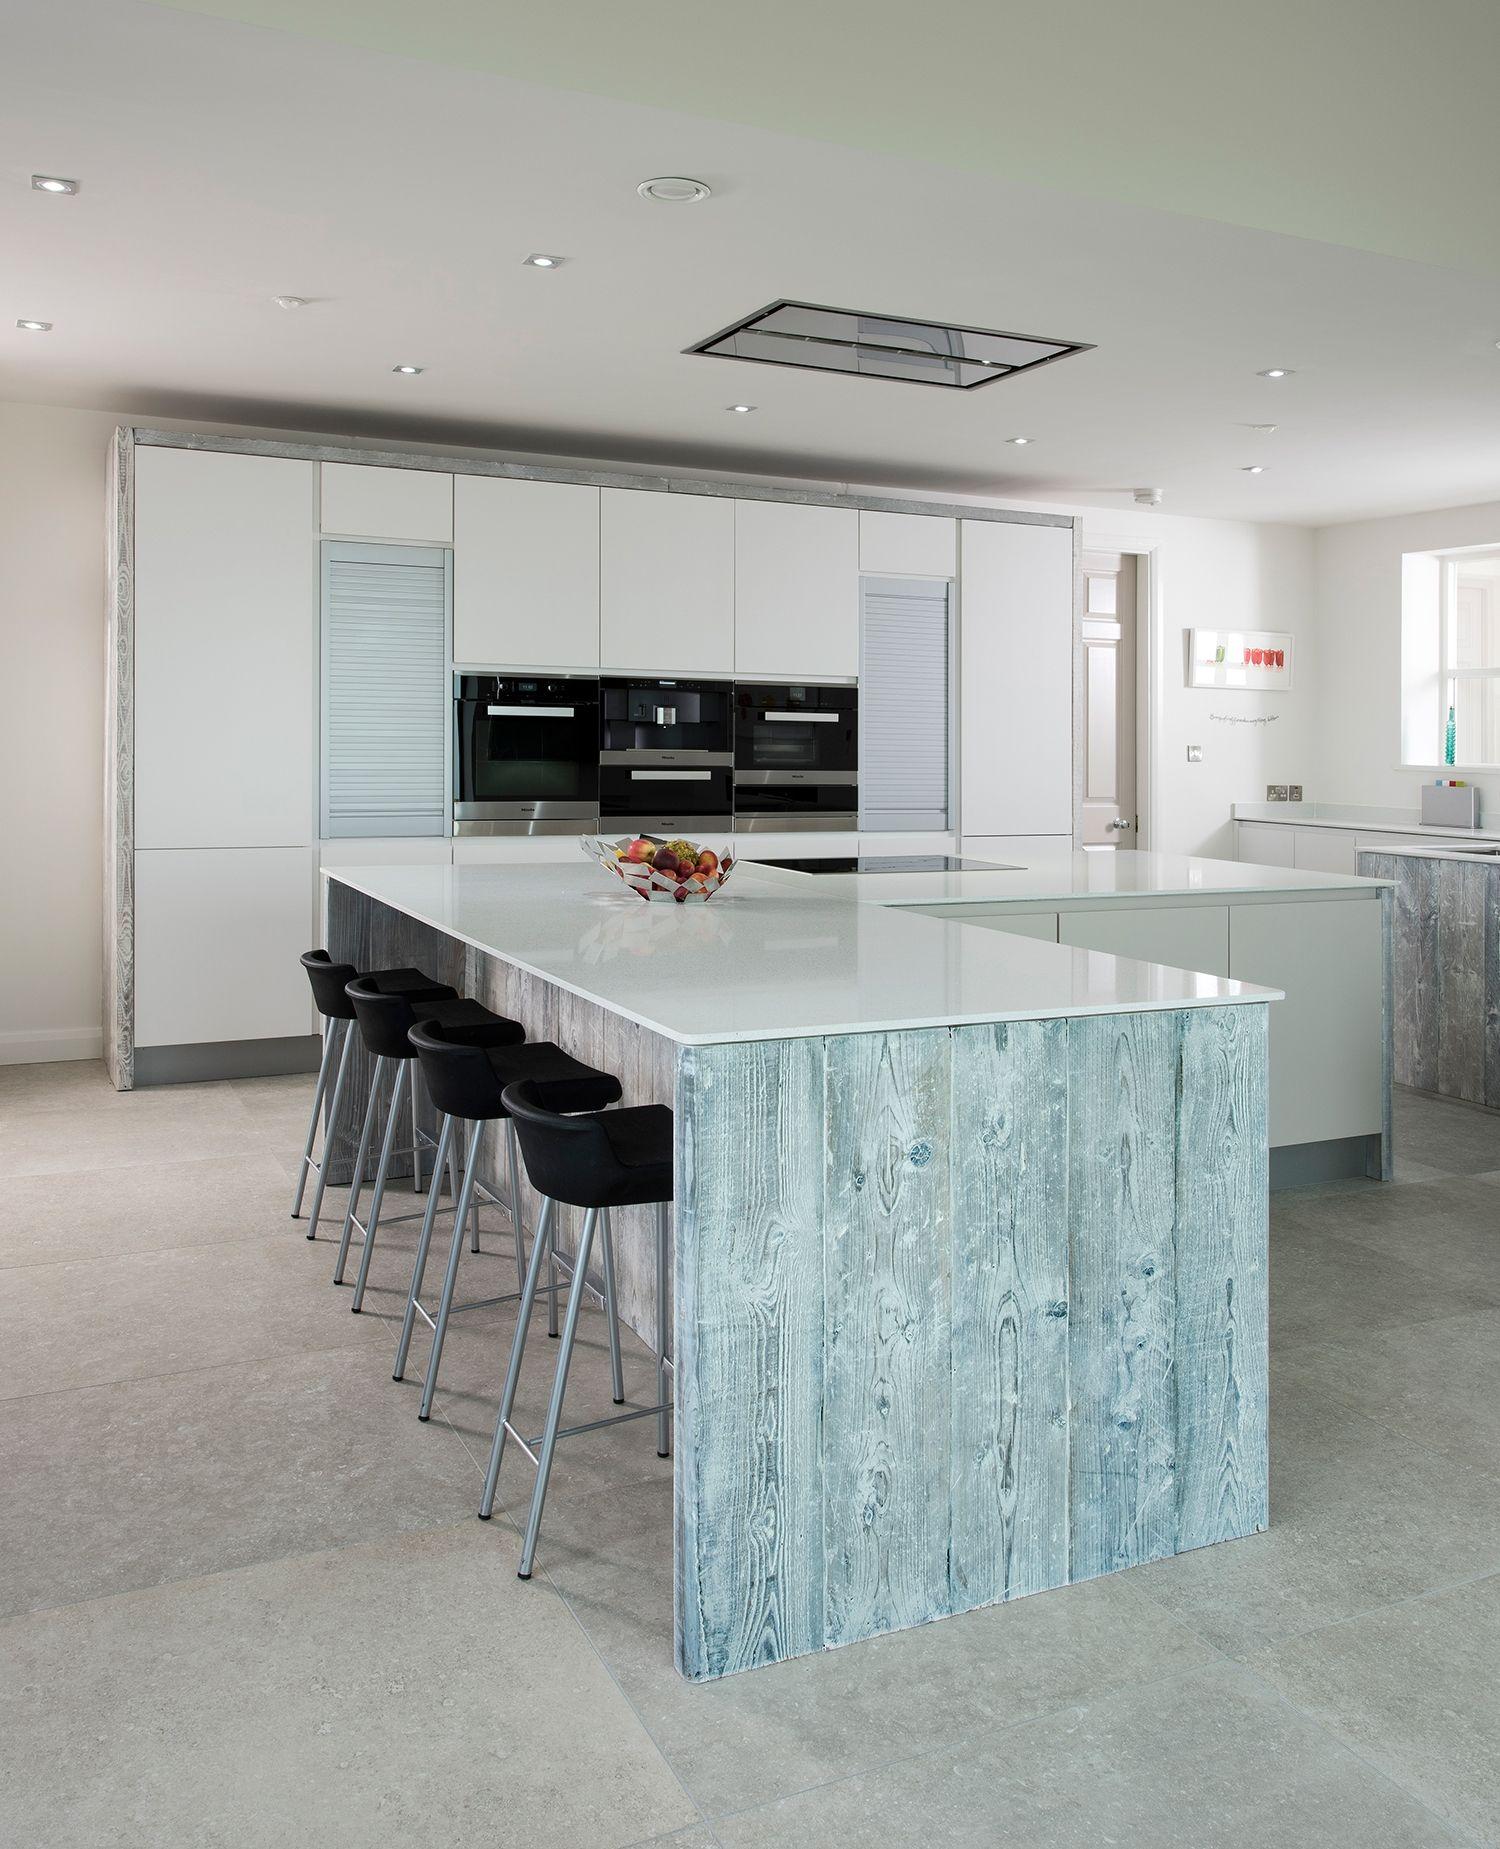 Luxury Driftwood Kitchen Composition - Kitchen Cabinets | Ideas ...